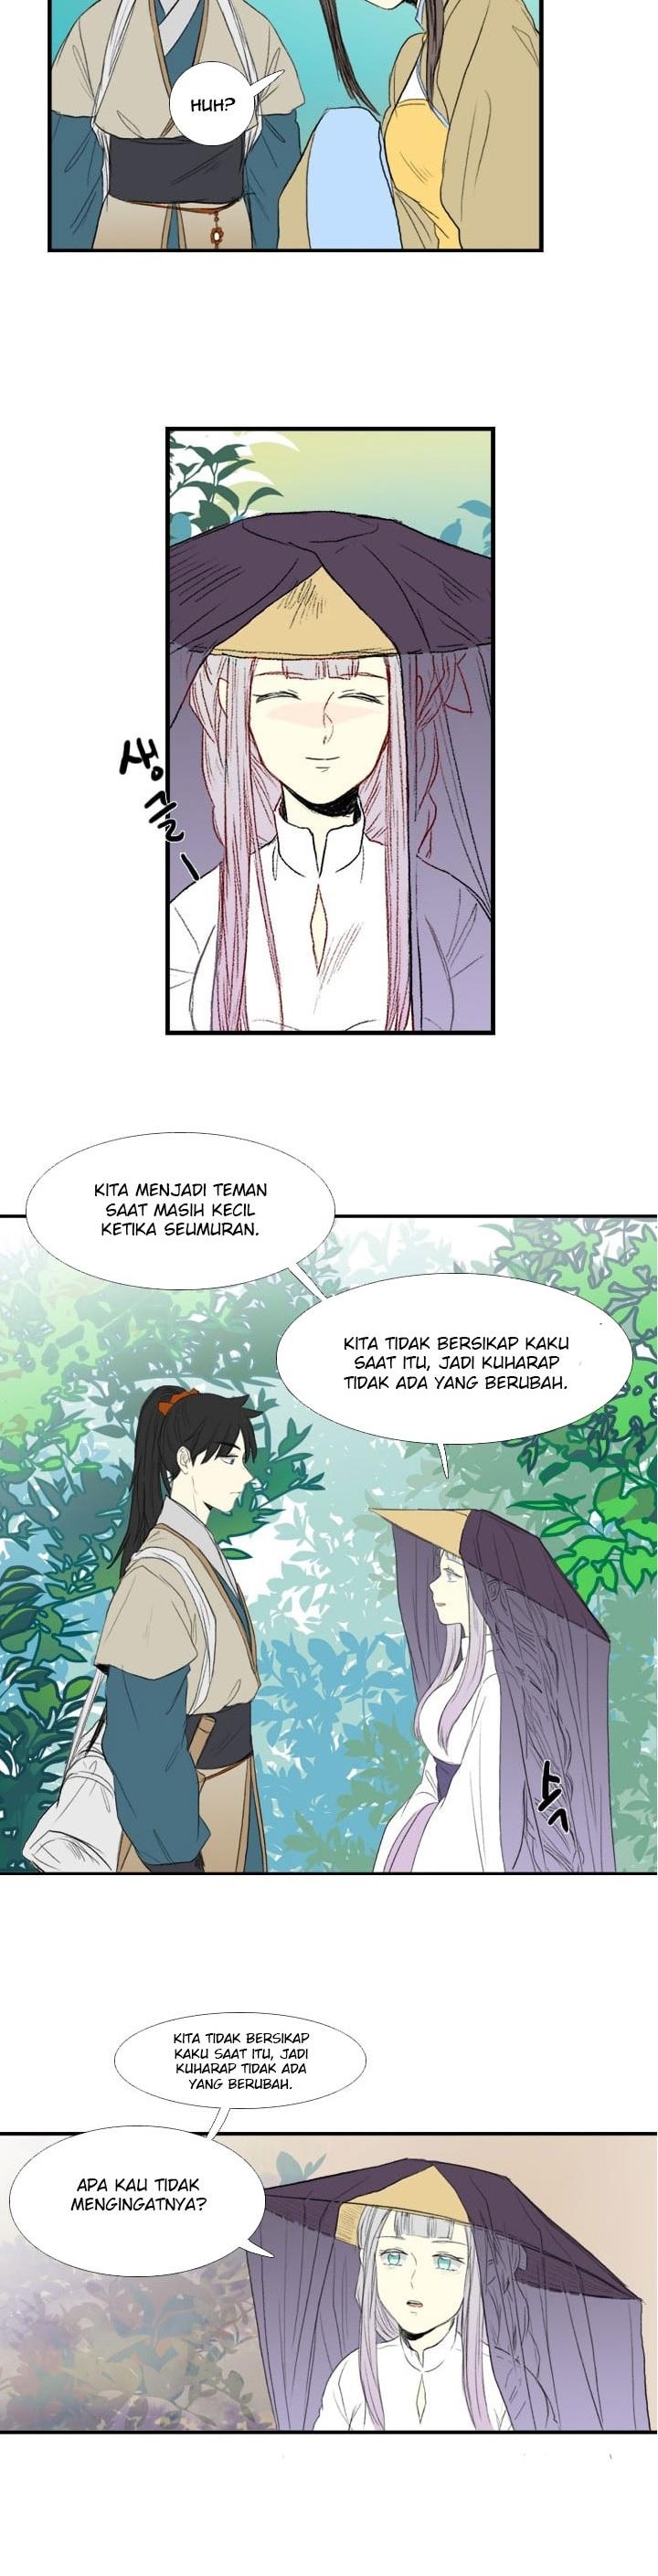 The Scholar's Reincarnation Chapter 37